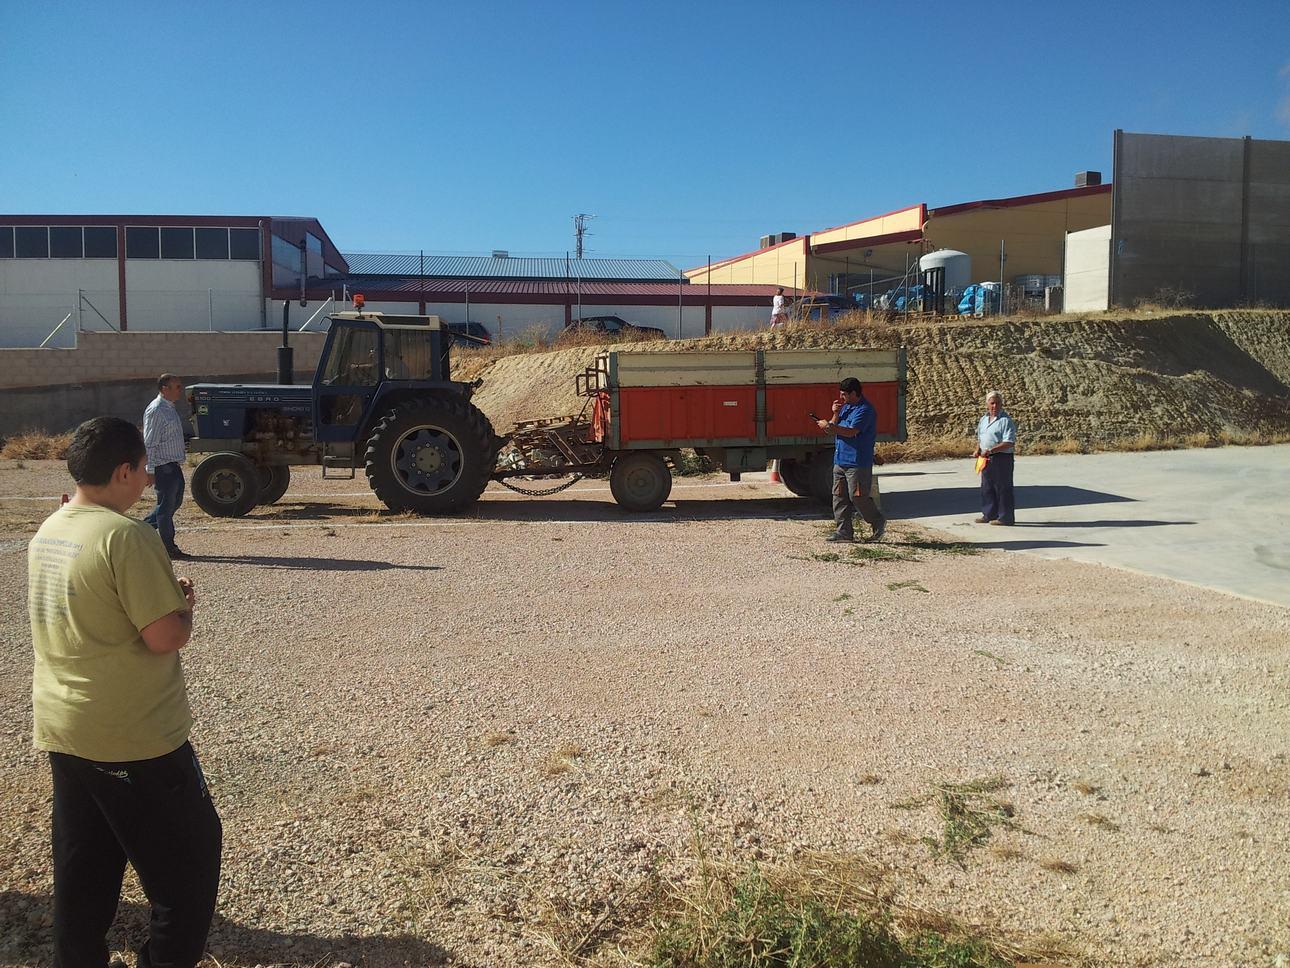 E Concurso de habilidad con maquinaria agrícola